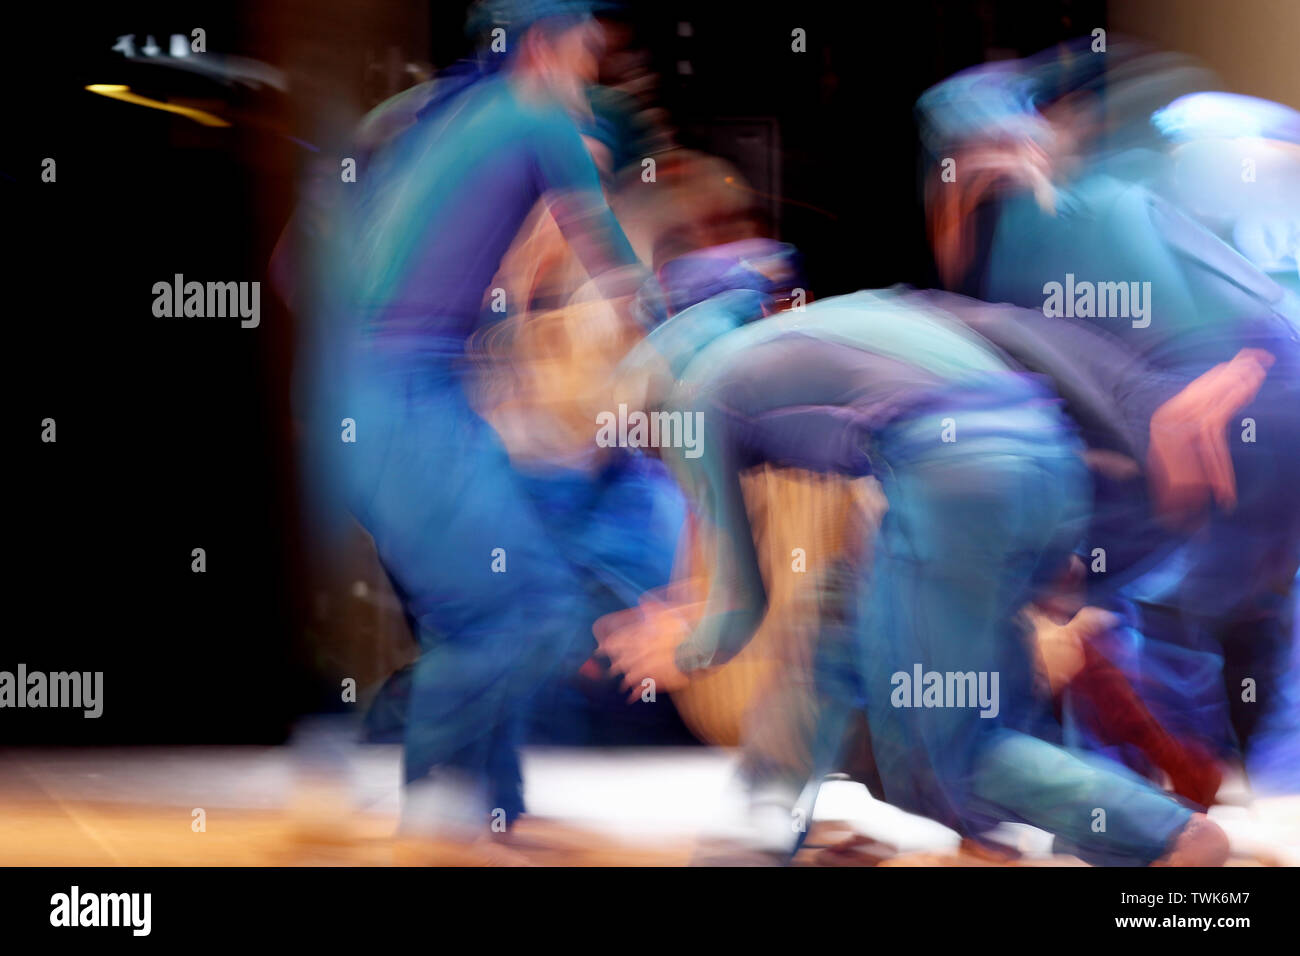 Expressive Dance Stock Photos & Expressive Dance Stock Images - Alamy